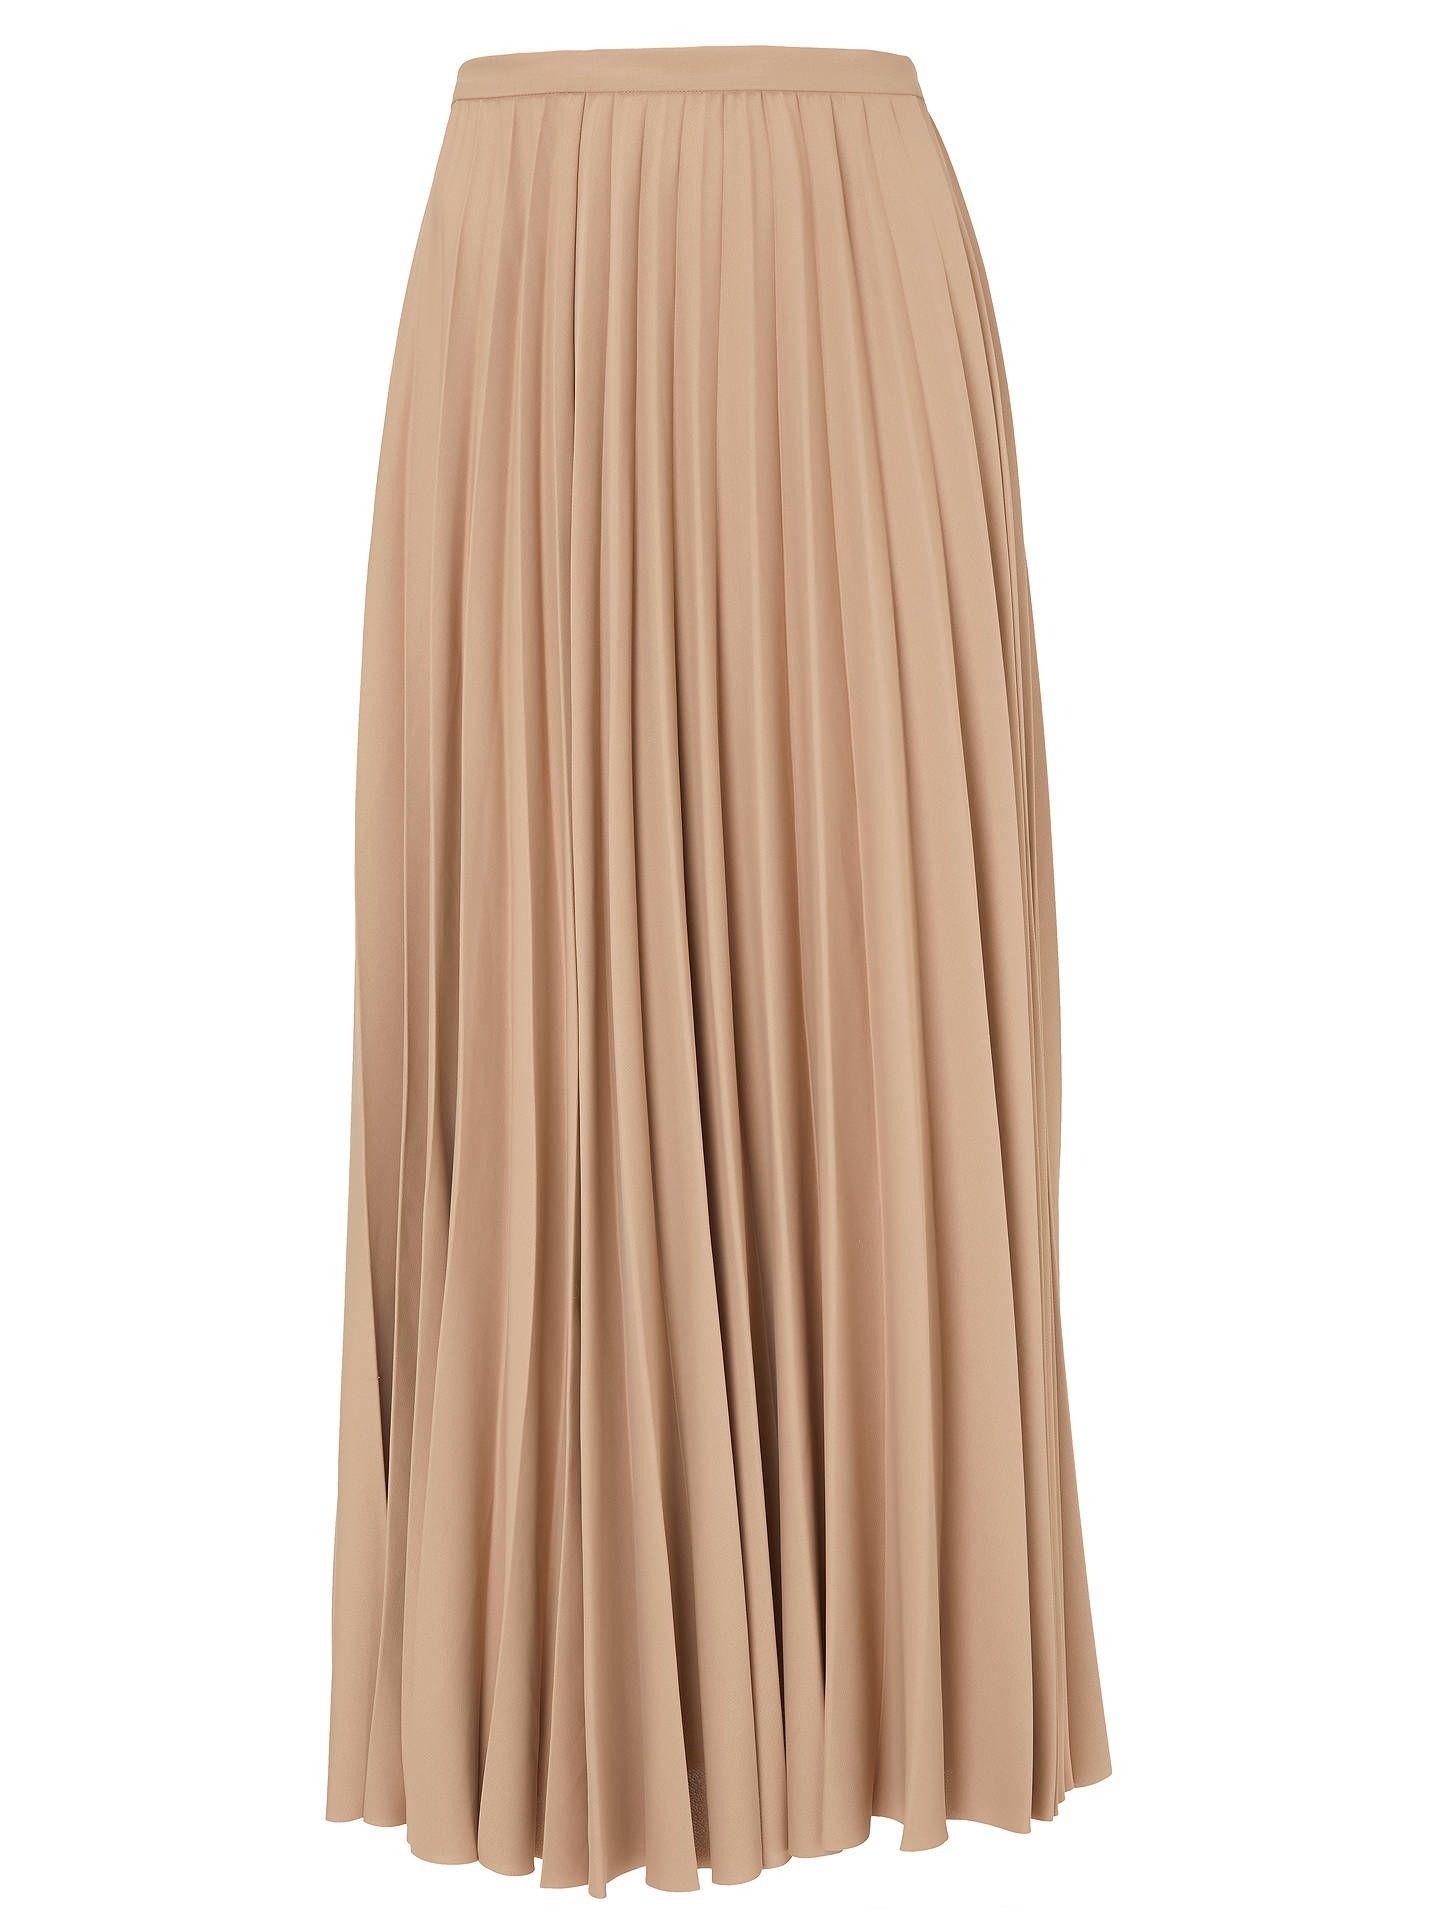 034a68788 BuyModern Rarity Sunray Pleated Midi Skirt, Camel, 18 Online at  johnlewis.com